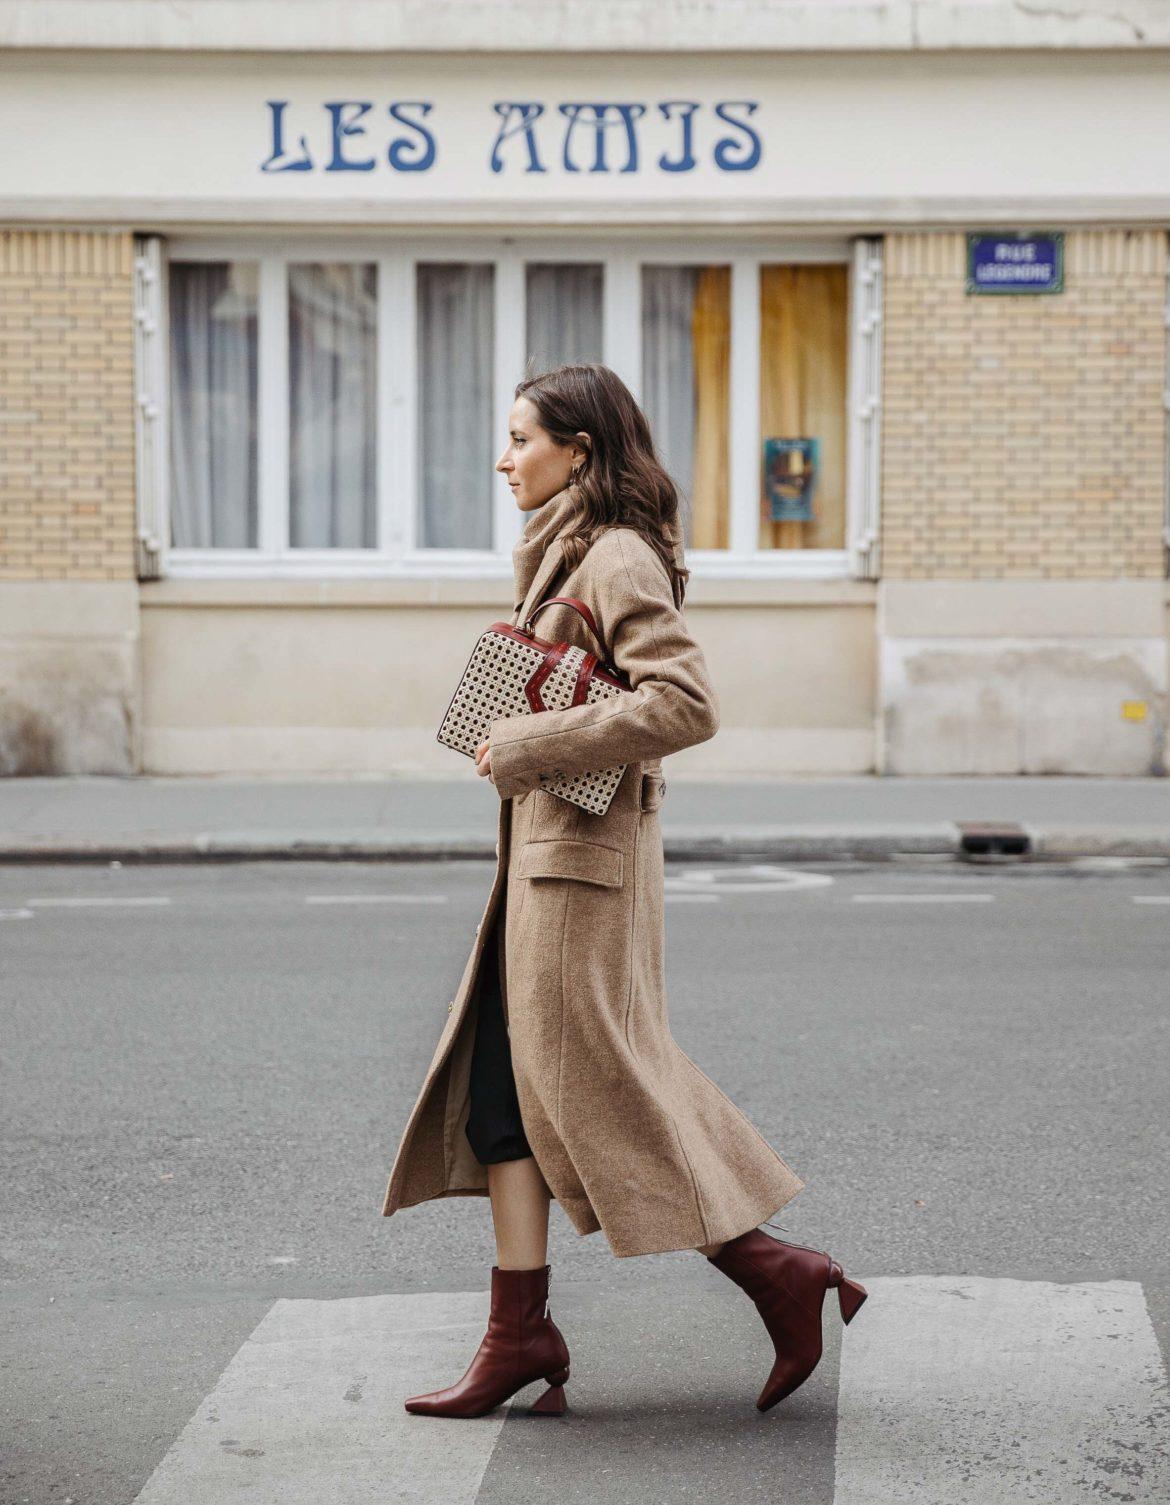 PFW SS20 Street Style Fall 2019 Paris Fashion Week Julia Comil wearing Negera coat, Nehera scarf, bag Mehry mu, boots Yuul Yie